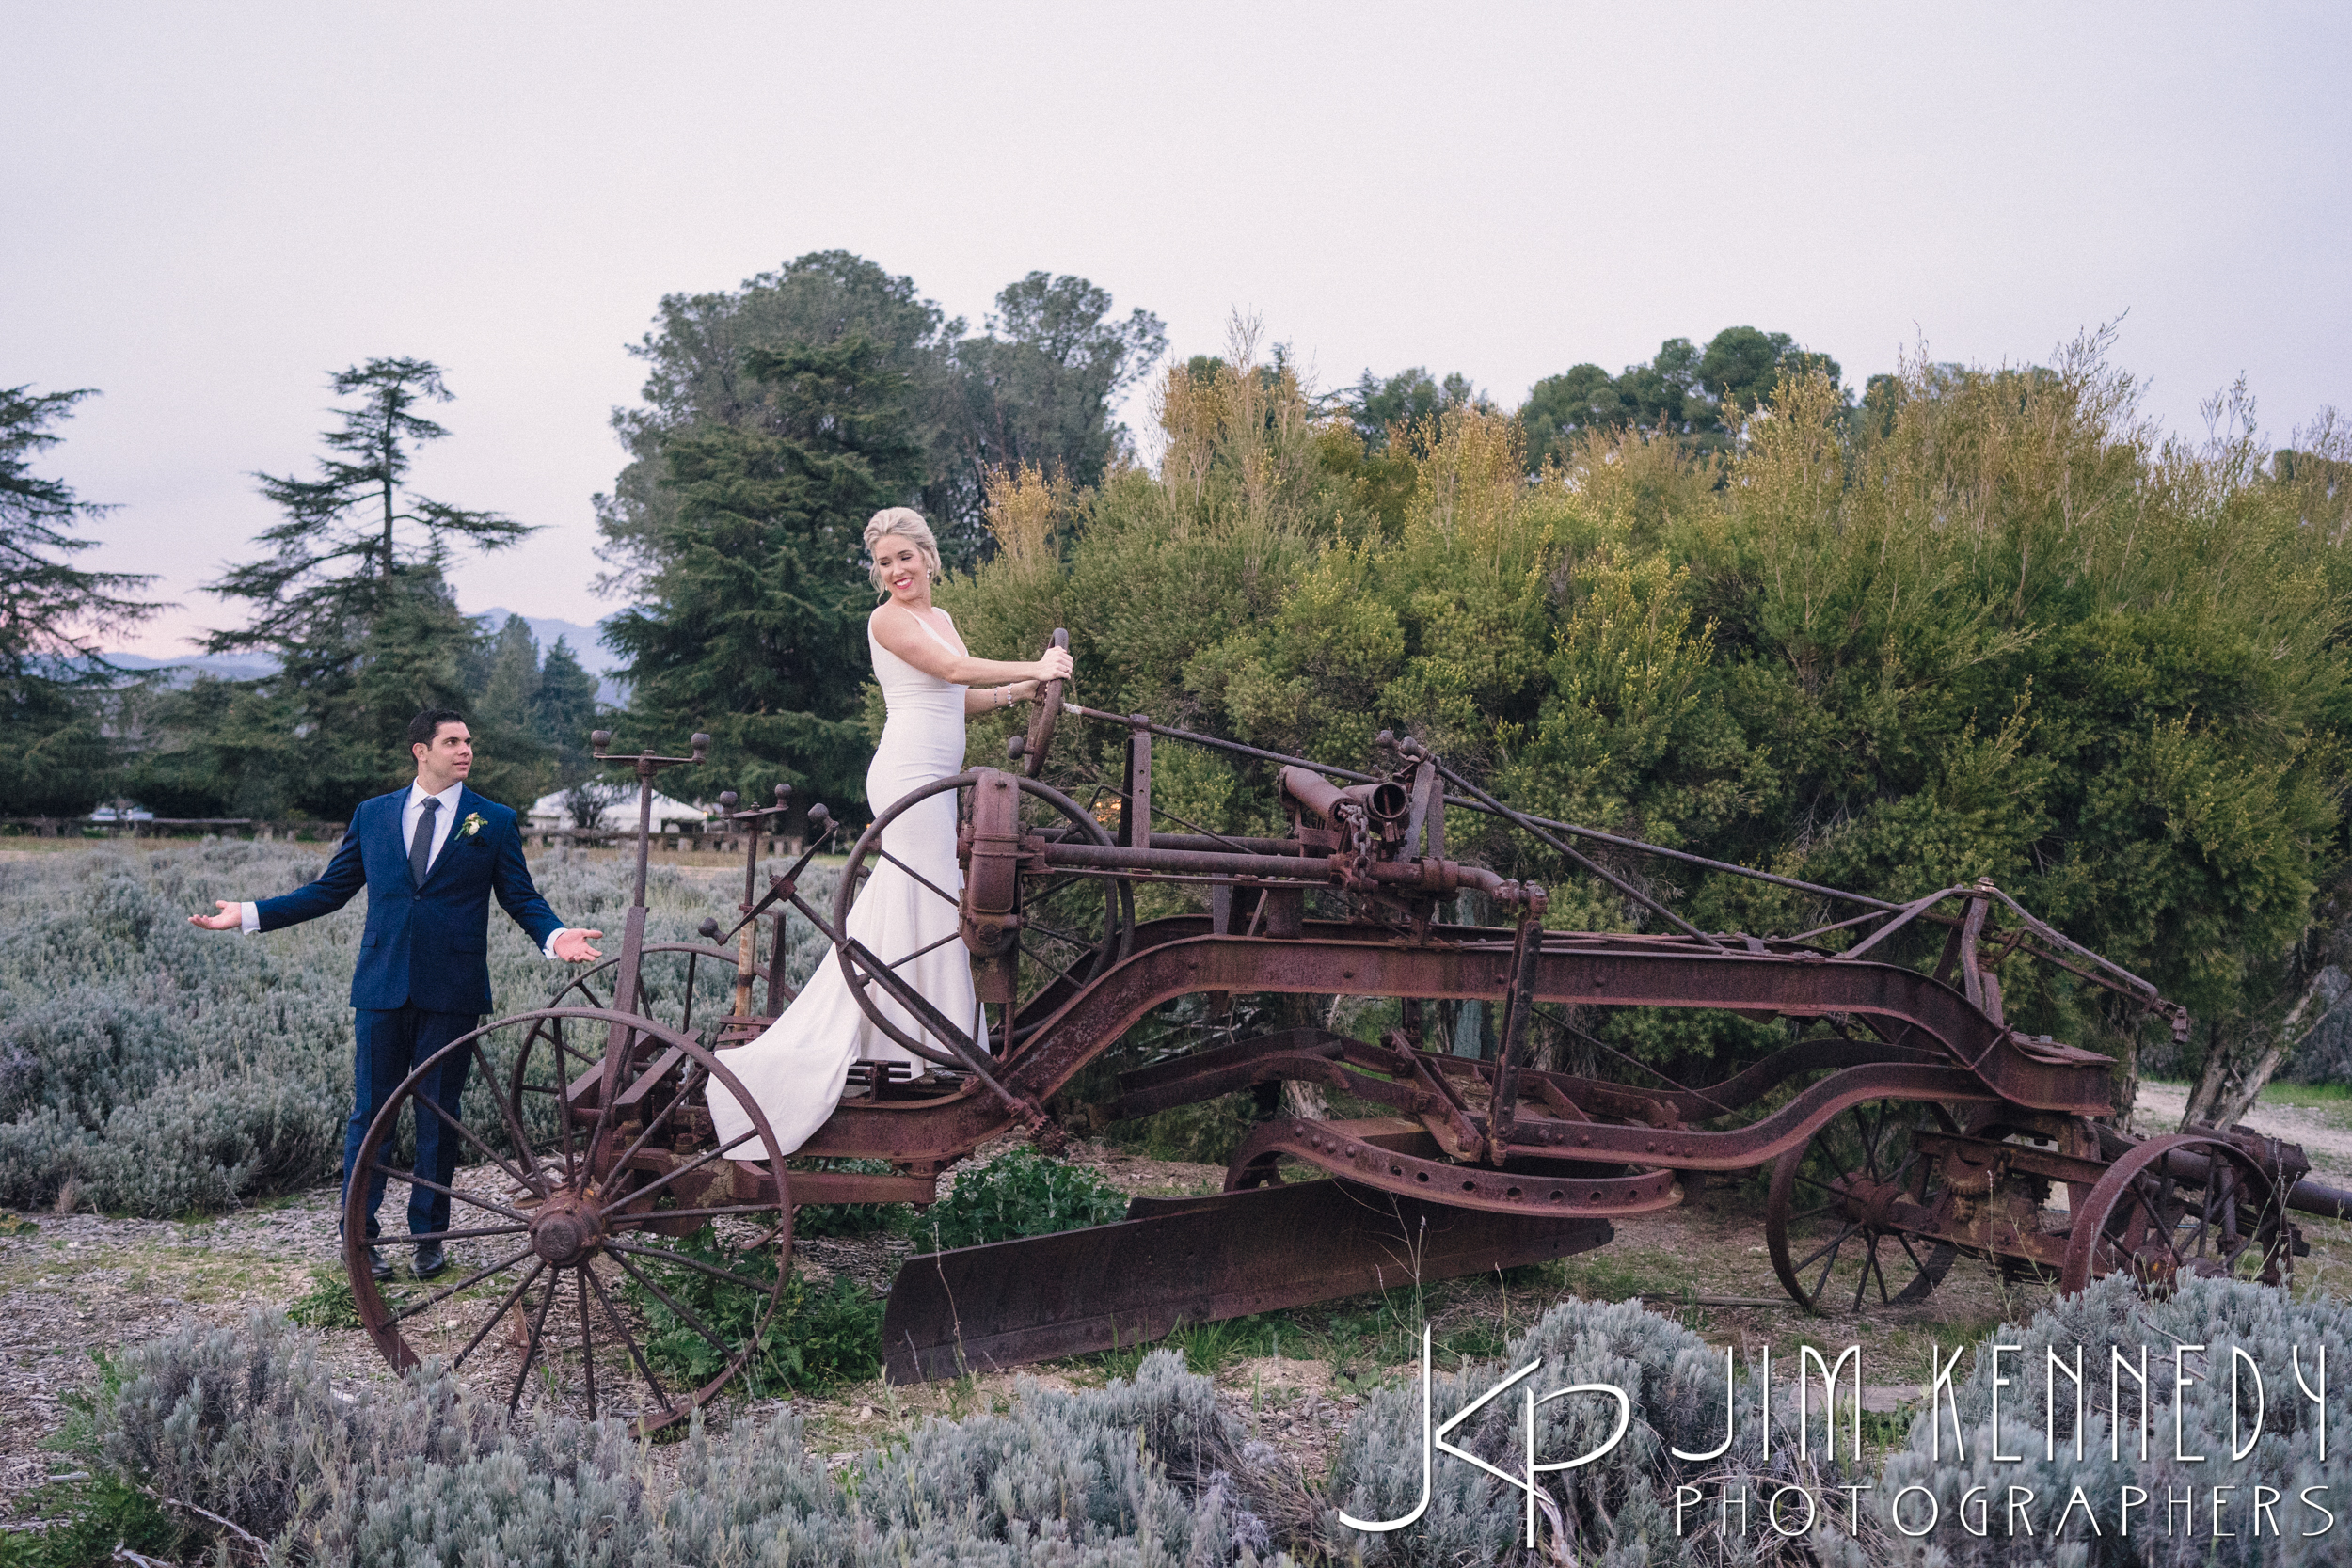 jim_kennedy_photographers_highland_springs_wedding_caitlyn_0167.jpg